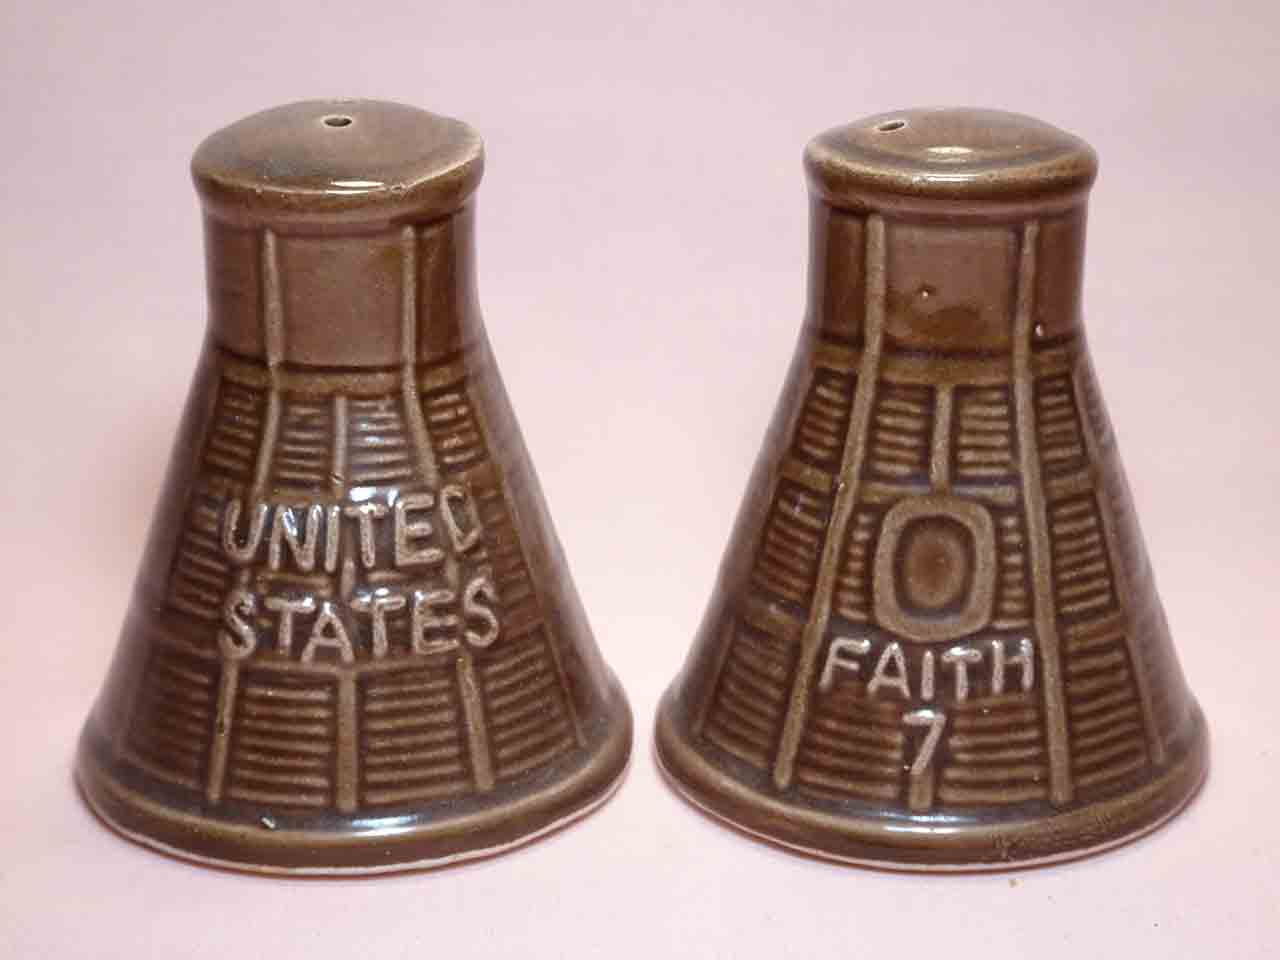 NASA Faith 7 spacecraft salt and pepper shakers